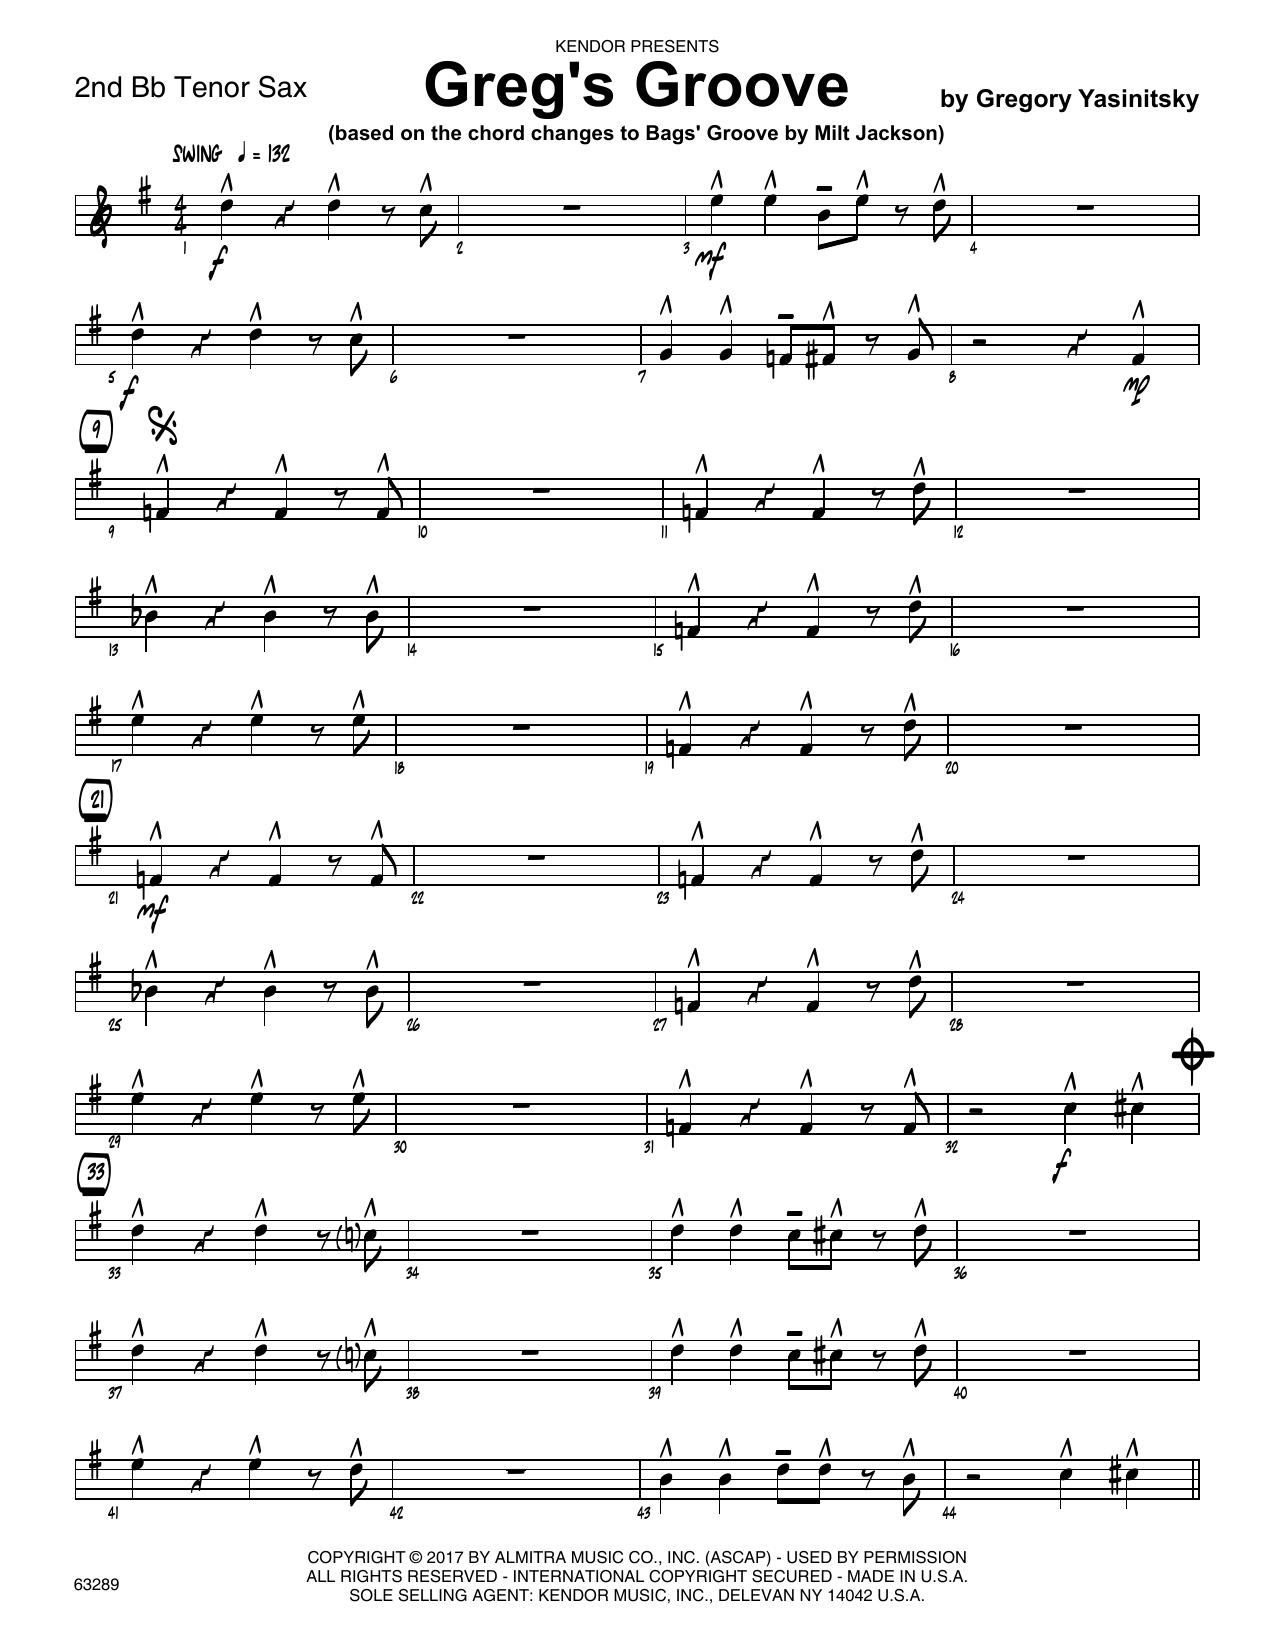 Greg's Groove - 2nd Bb Tenor Saxophone Sheet Music